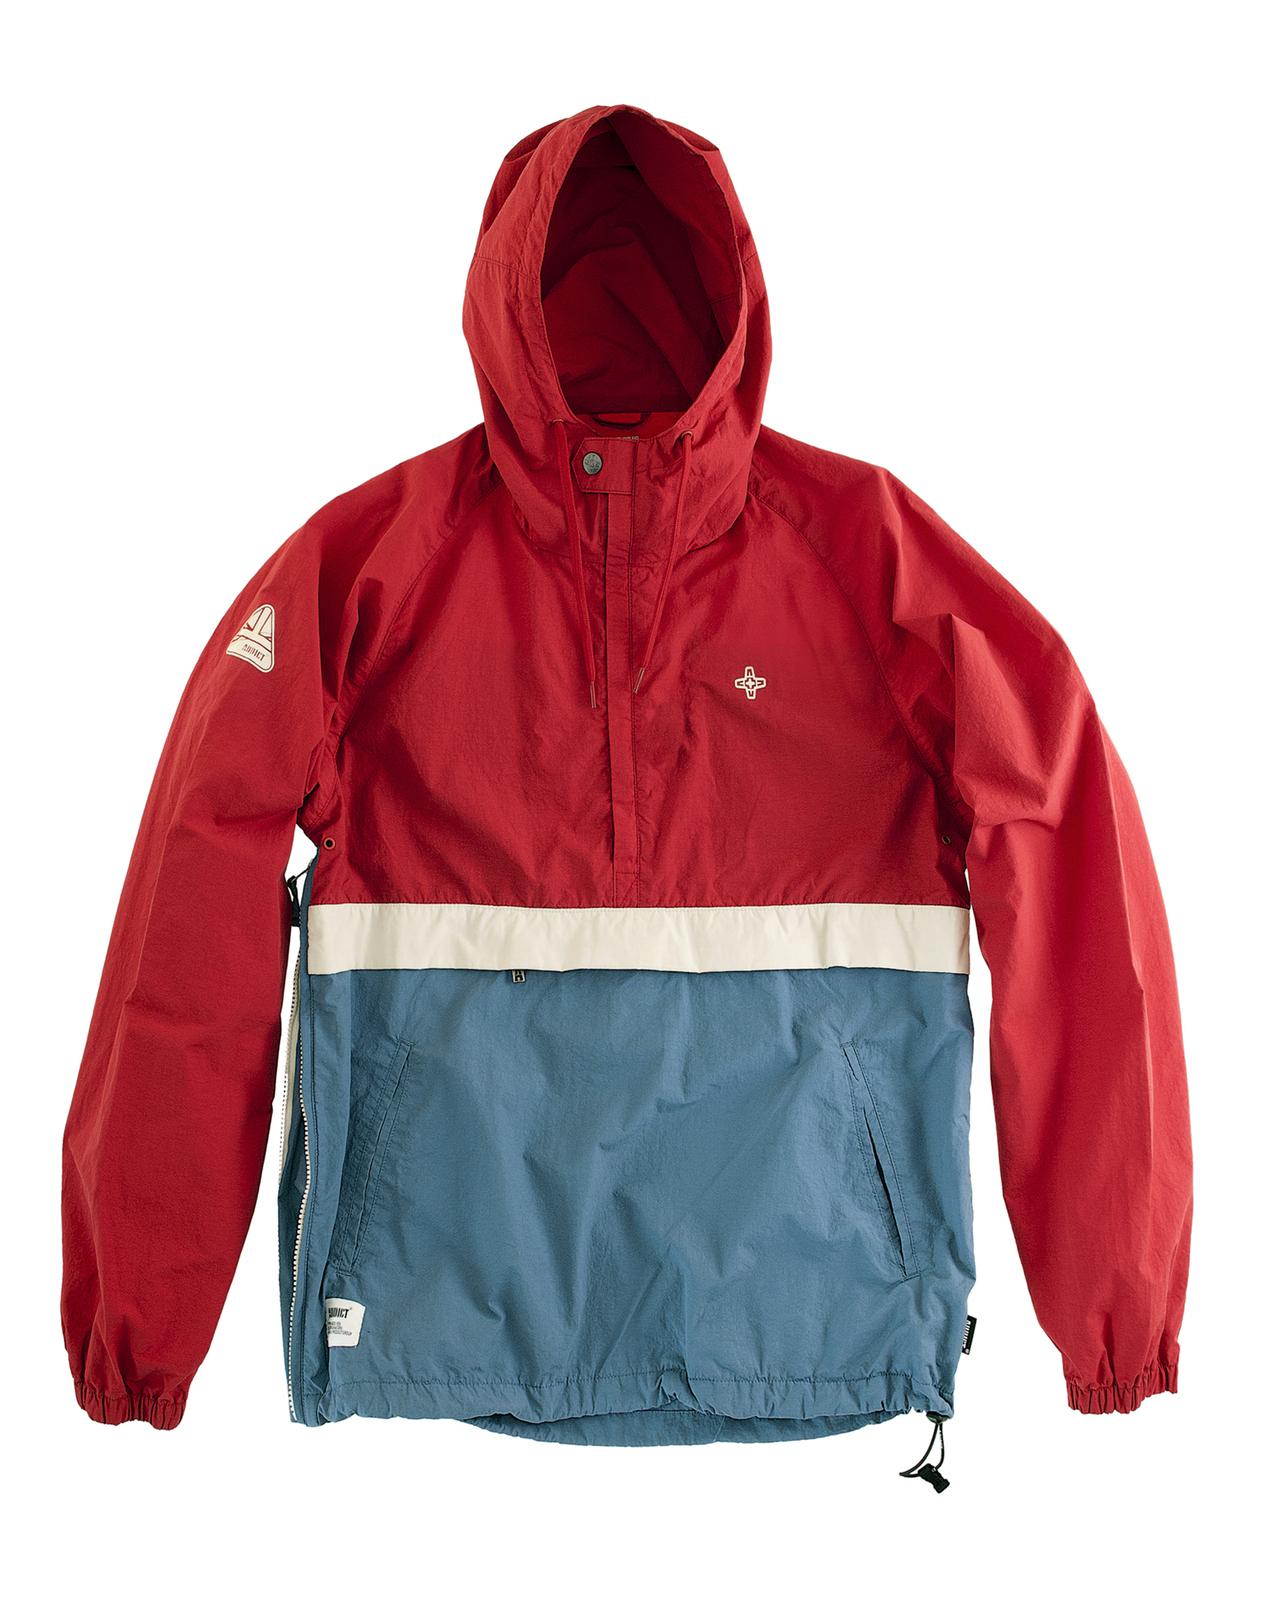 Mens jacket half - Image Is Loading Addict Mens Eavis Smock Half Zip Hooded Jacket